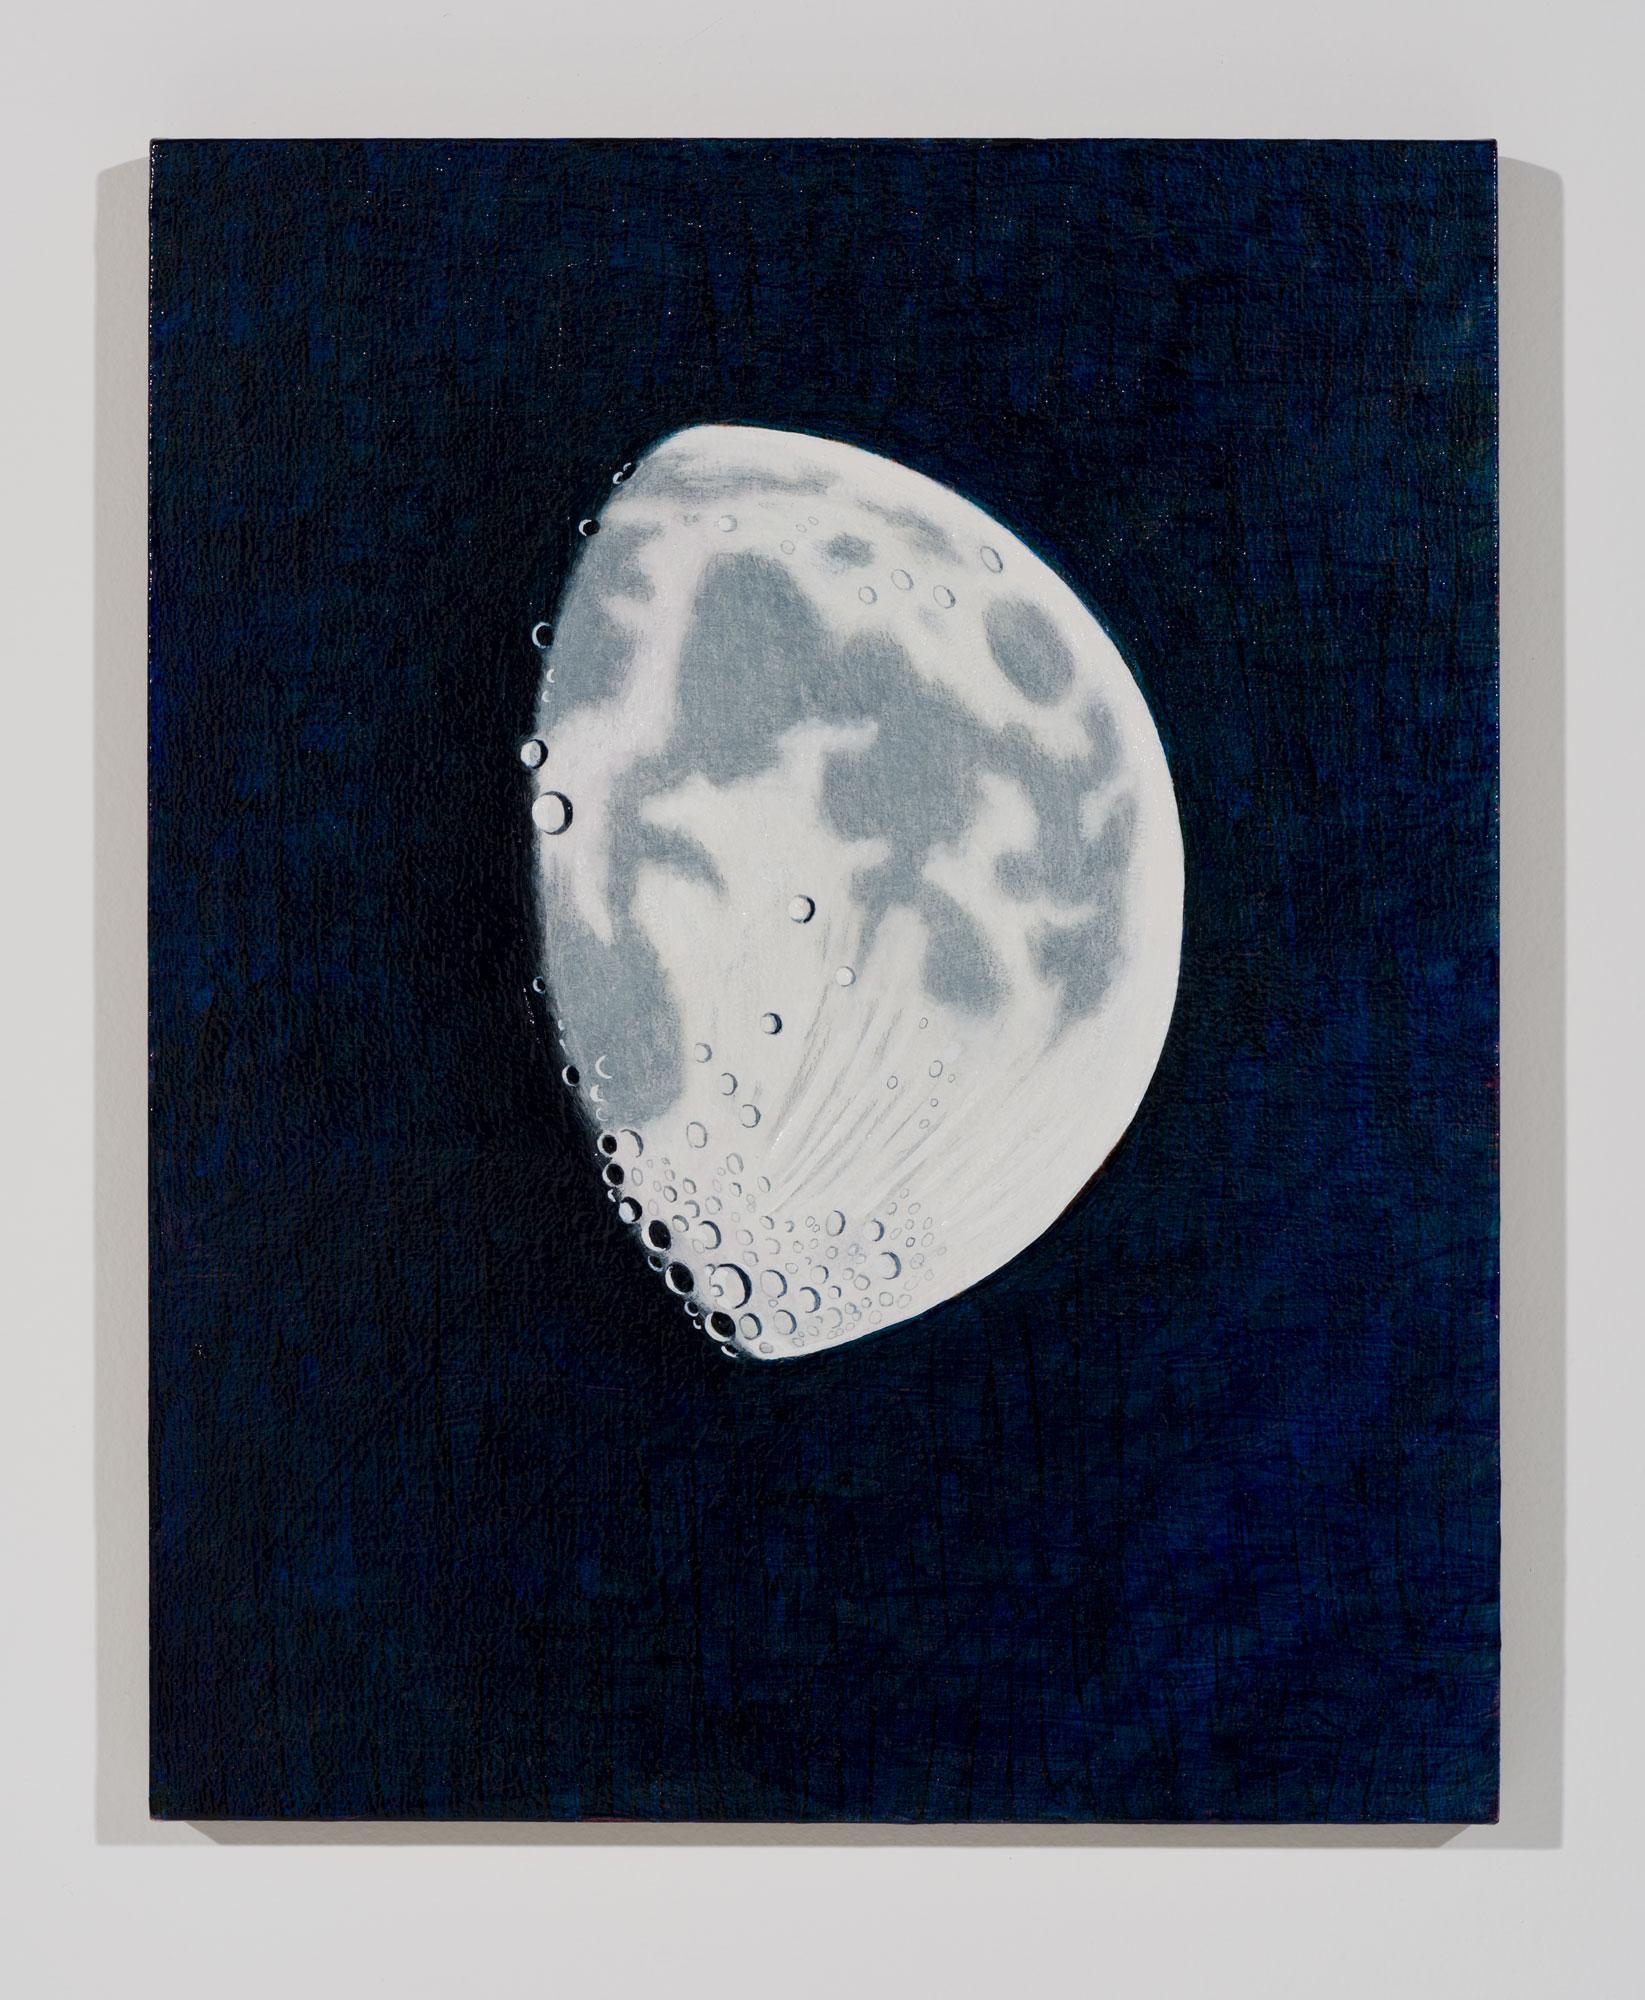 The Moon, 8.20.18, 2019